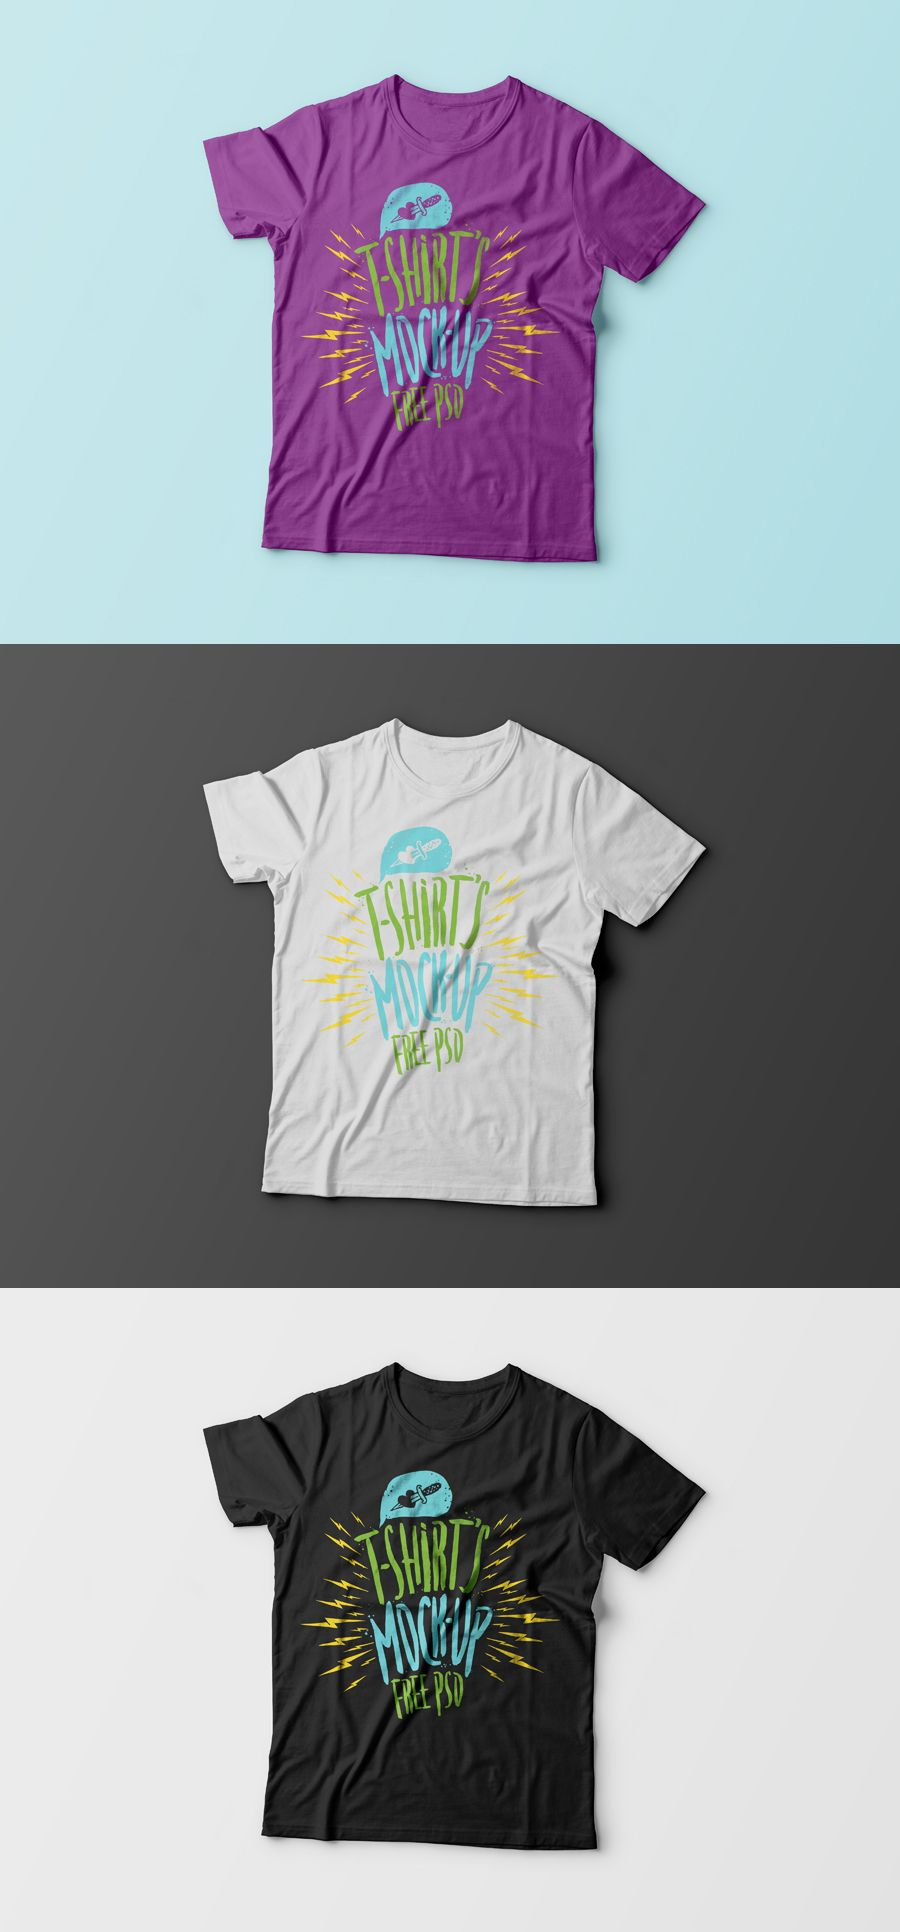 Pin de Leo Zero Studio en GRAPHICS STUFF | Pinterest